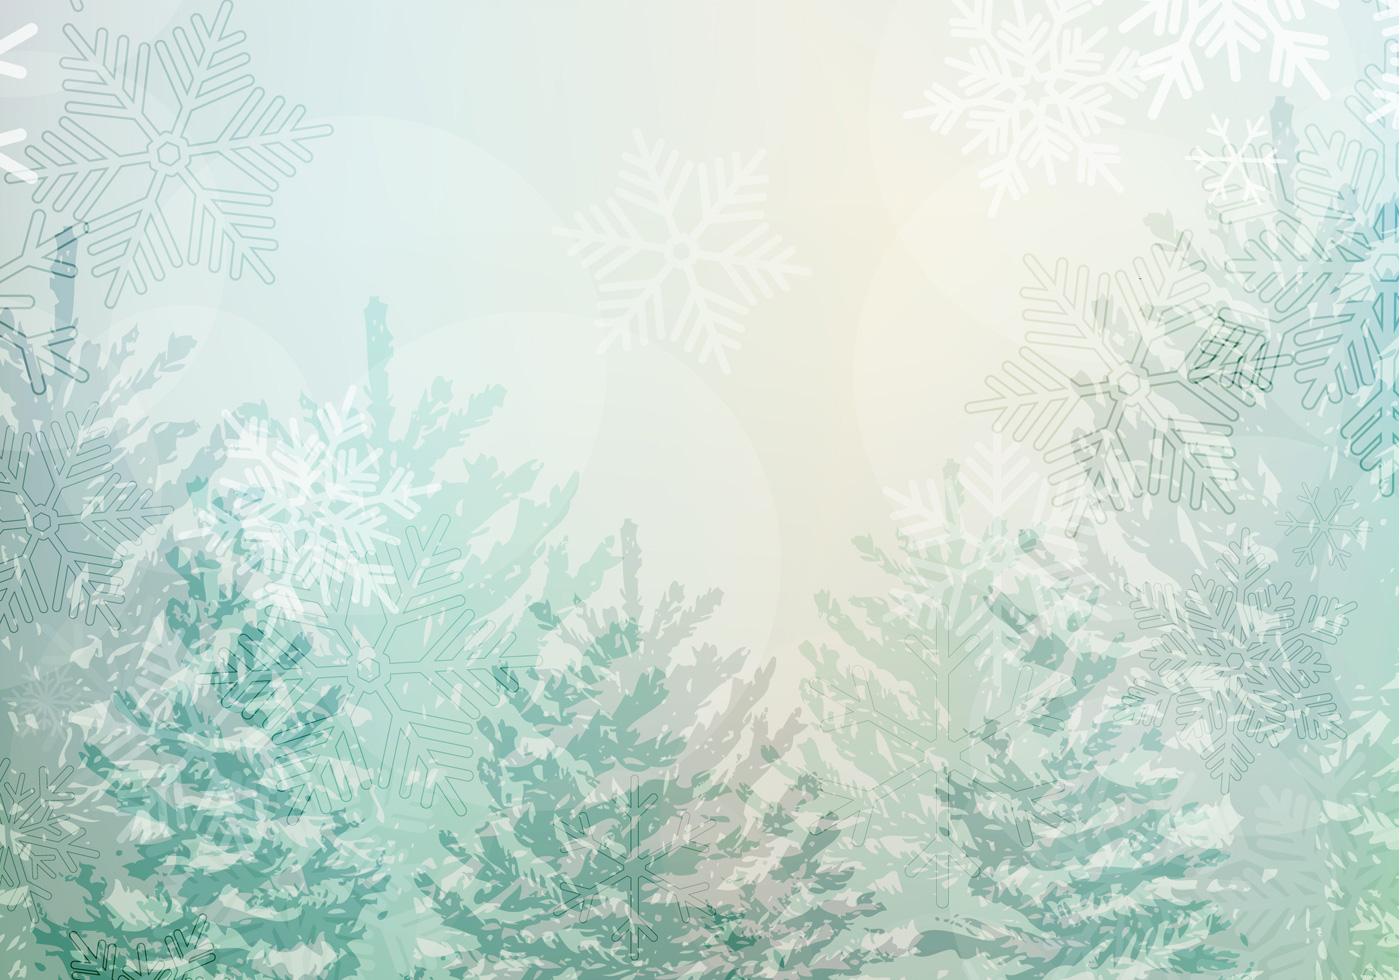 Snowy Winter Landscape Wallpaper Pack Free Photoshop